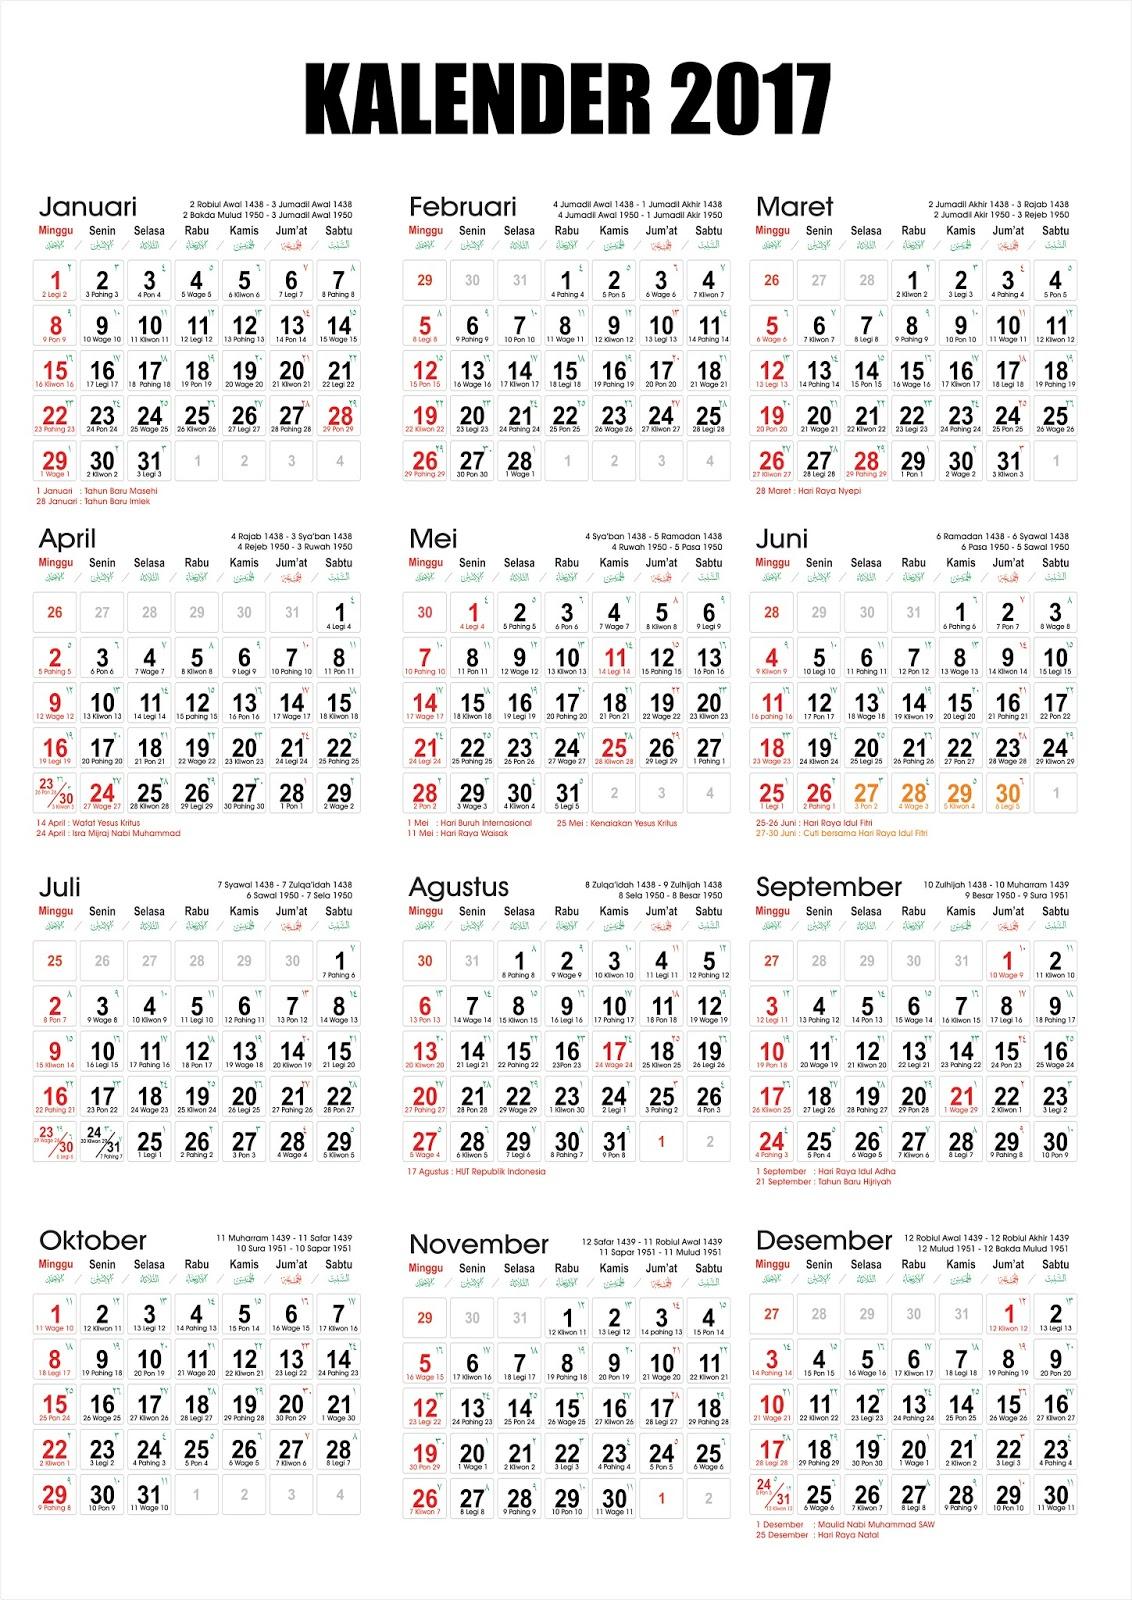 Kalender 2017 Indonesia Cdr : kalender, indonesia, Kalender, Lengkap, Fasrrecord